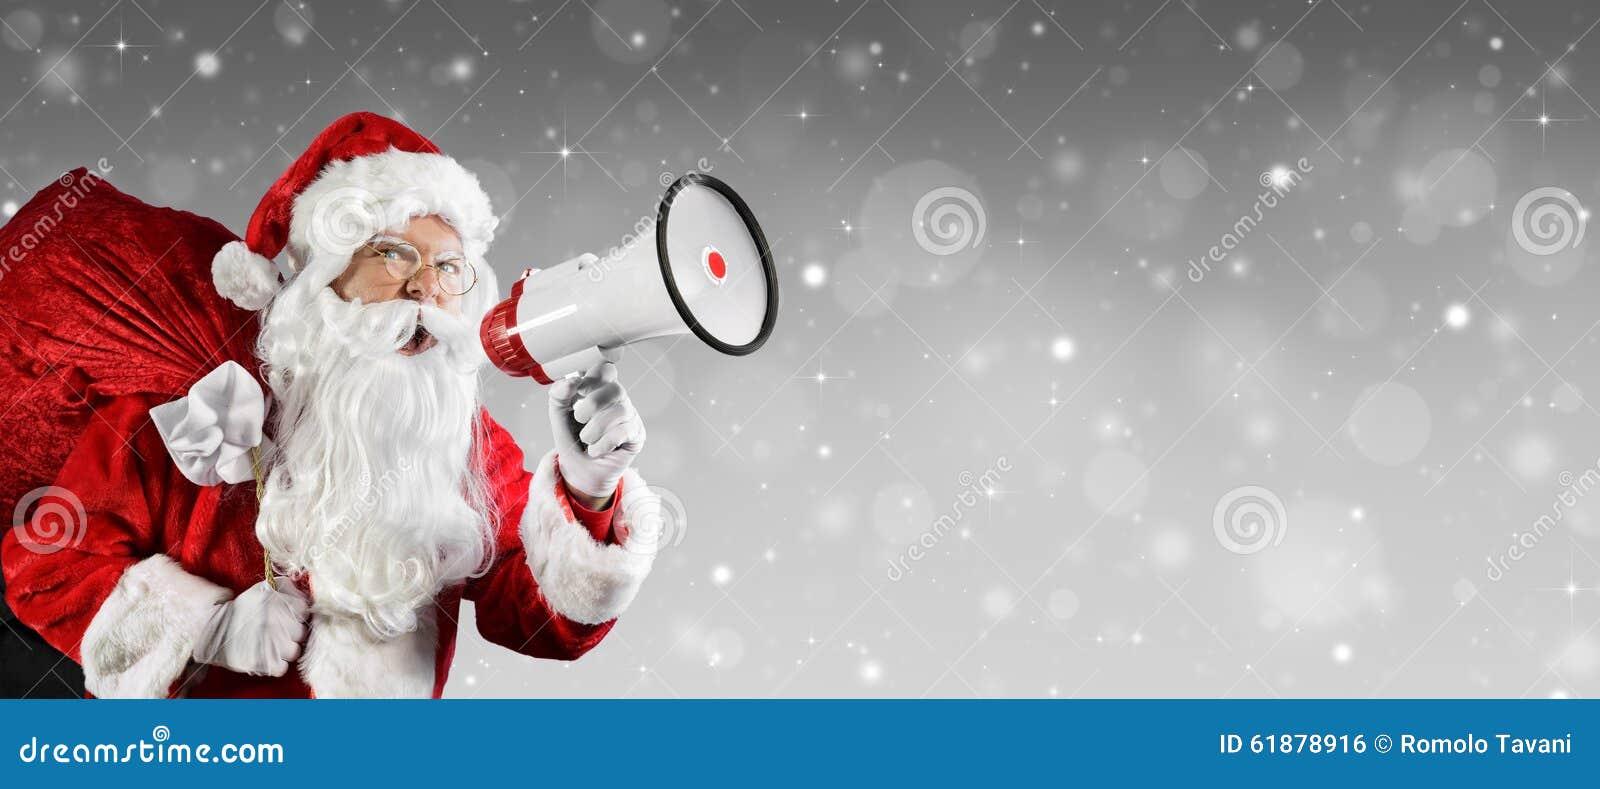 Santa Claus Talking